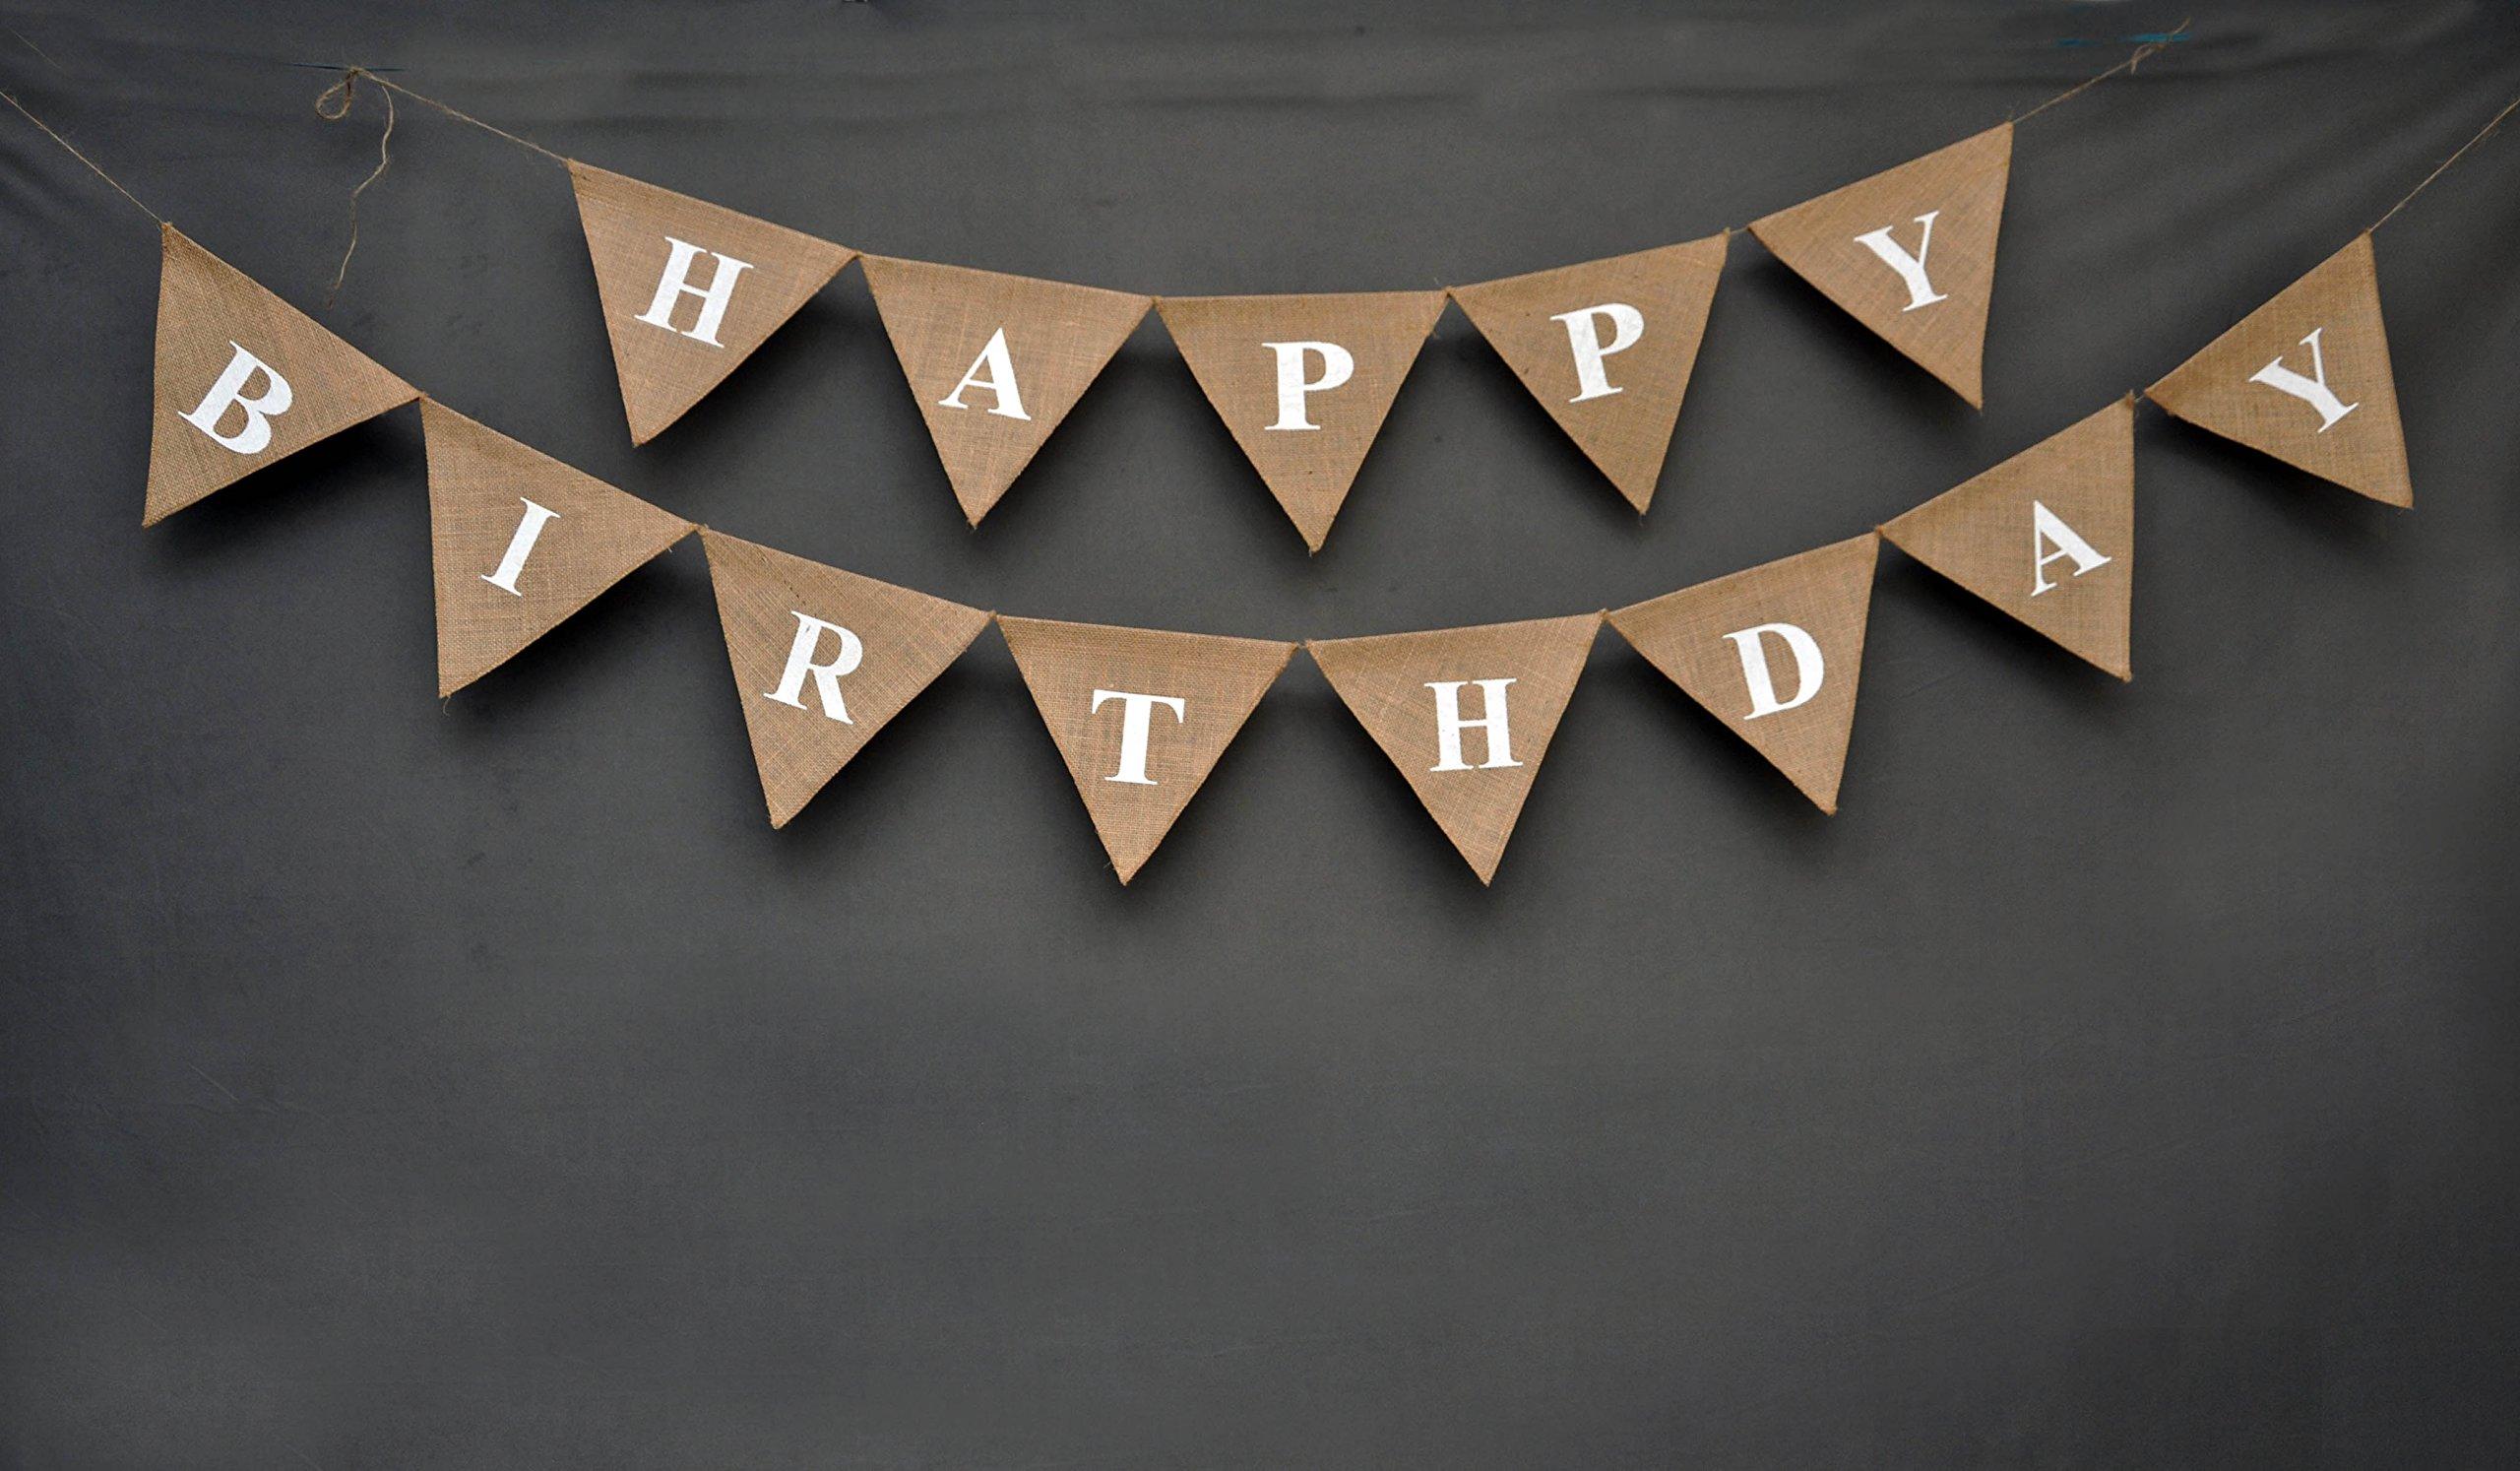 Happy Birthday Banner- Burlap Banner - Rustic Burlap Birthday Banner - Rustic Elegant Happy Birthday Bunting - Unisex Birthday Garland - Rustic Elegant Universal Birthday Decor